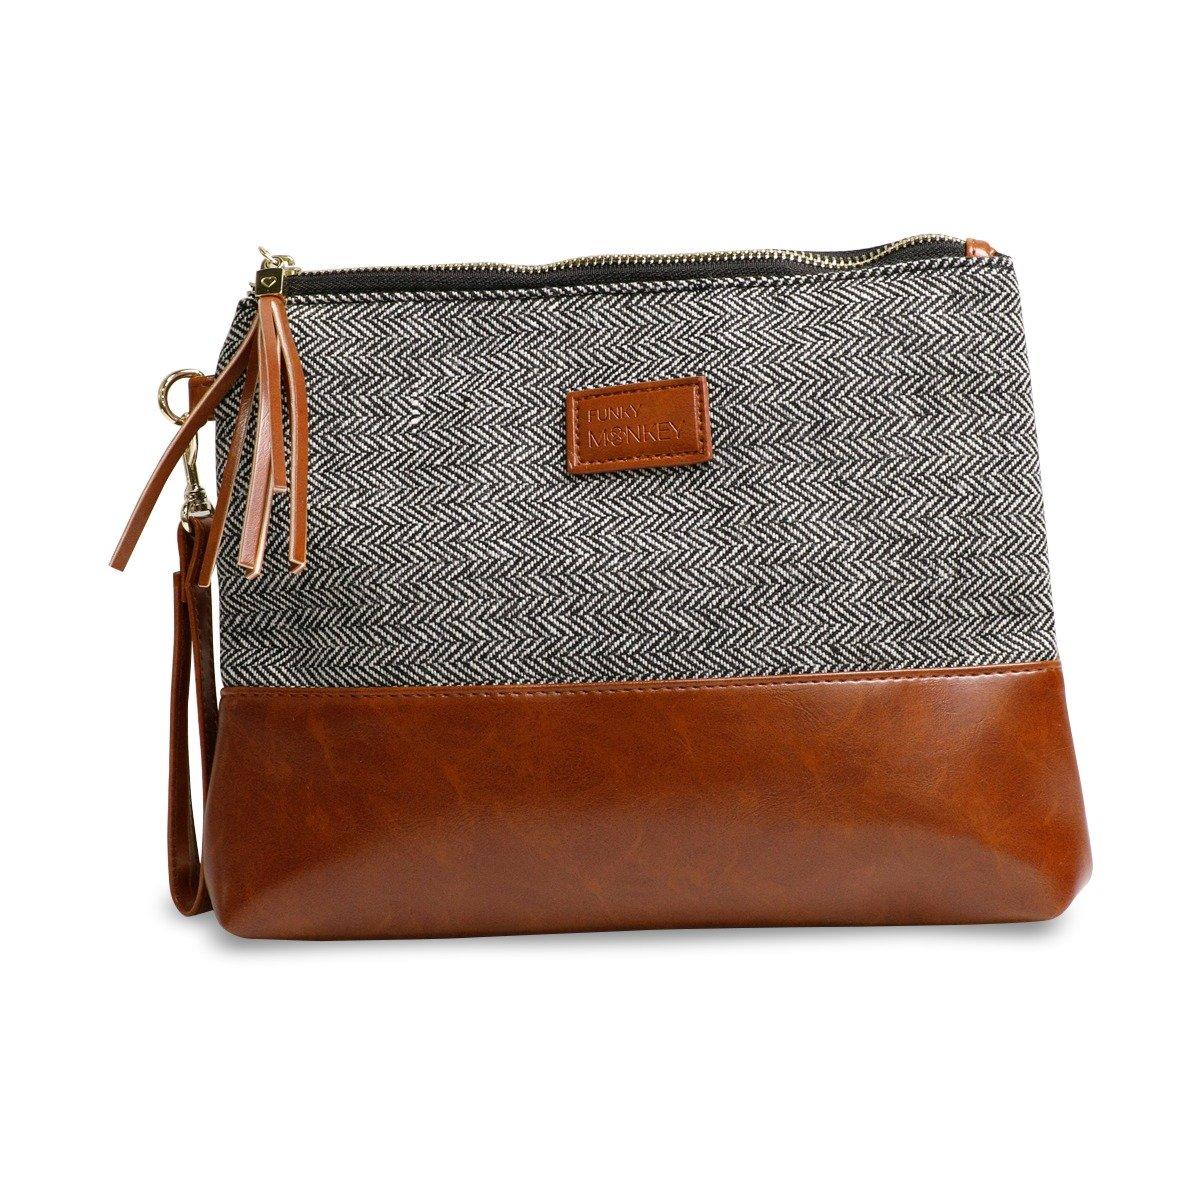 {Erika Collection} Wristlet Wallet Clutch Bag - Phone Purse Handbag - Small, Medium Large Size - Brown & Gray Horizontal Herringbone Style, Vegan Bottom Urban- Funky Monkey Fashion (Large)